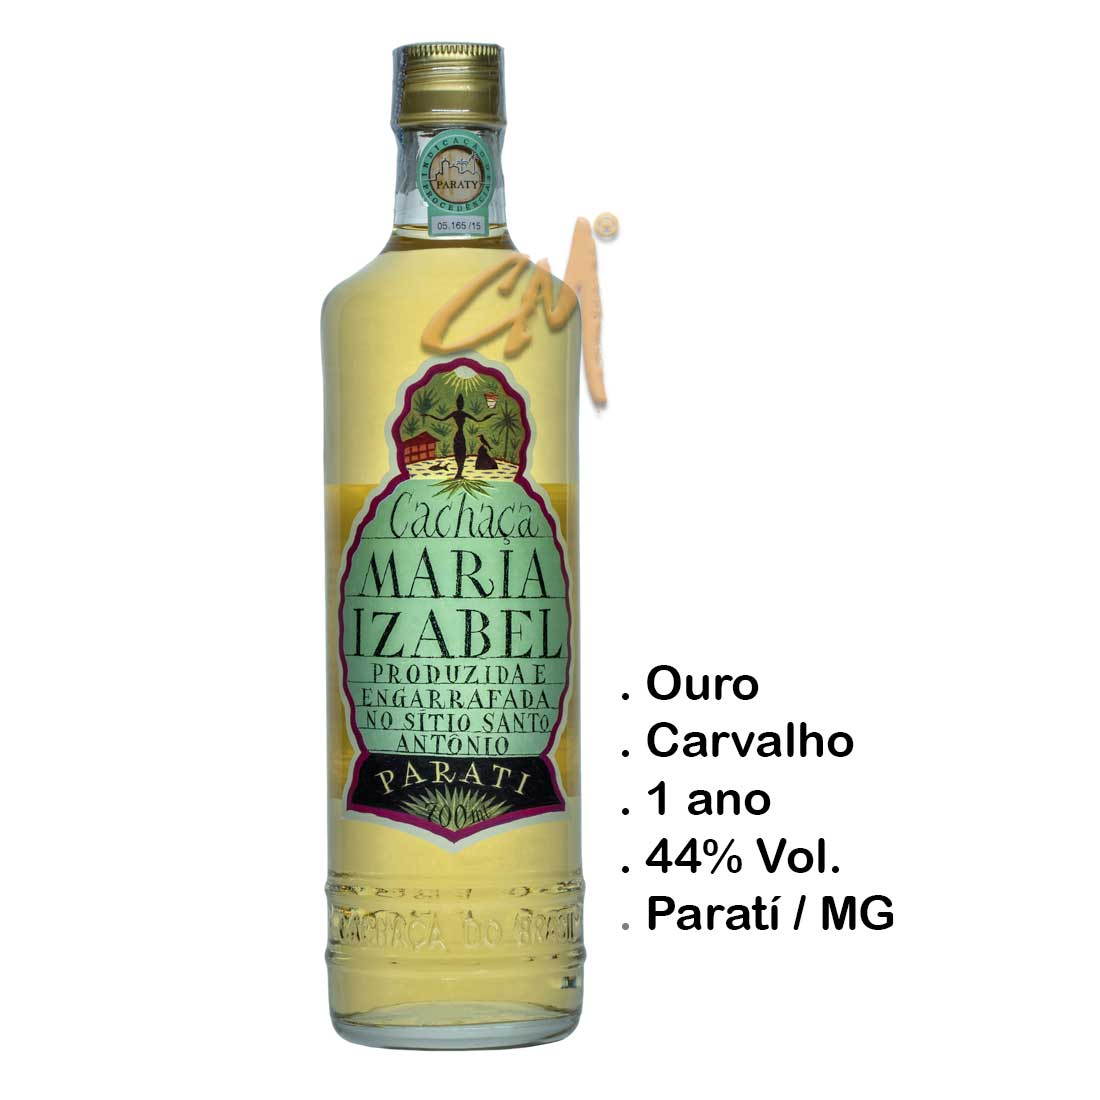 Cachaça Maria Izabel Ouro 700 ml (Paratí - RJ)